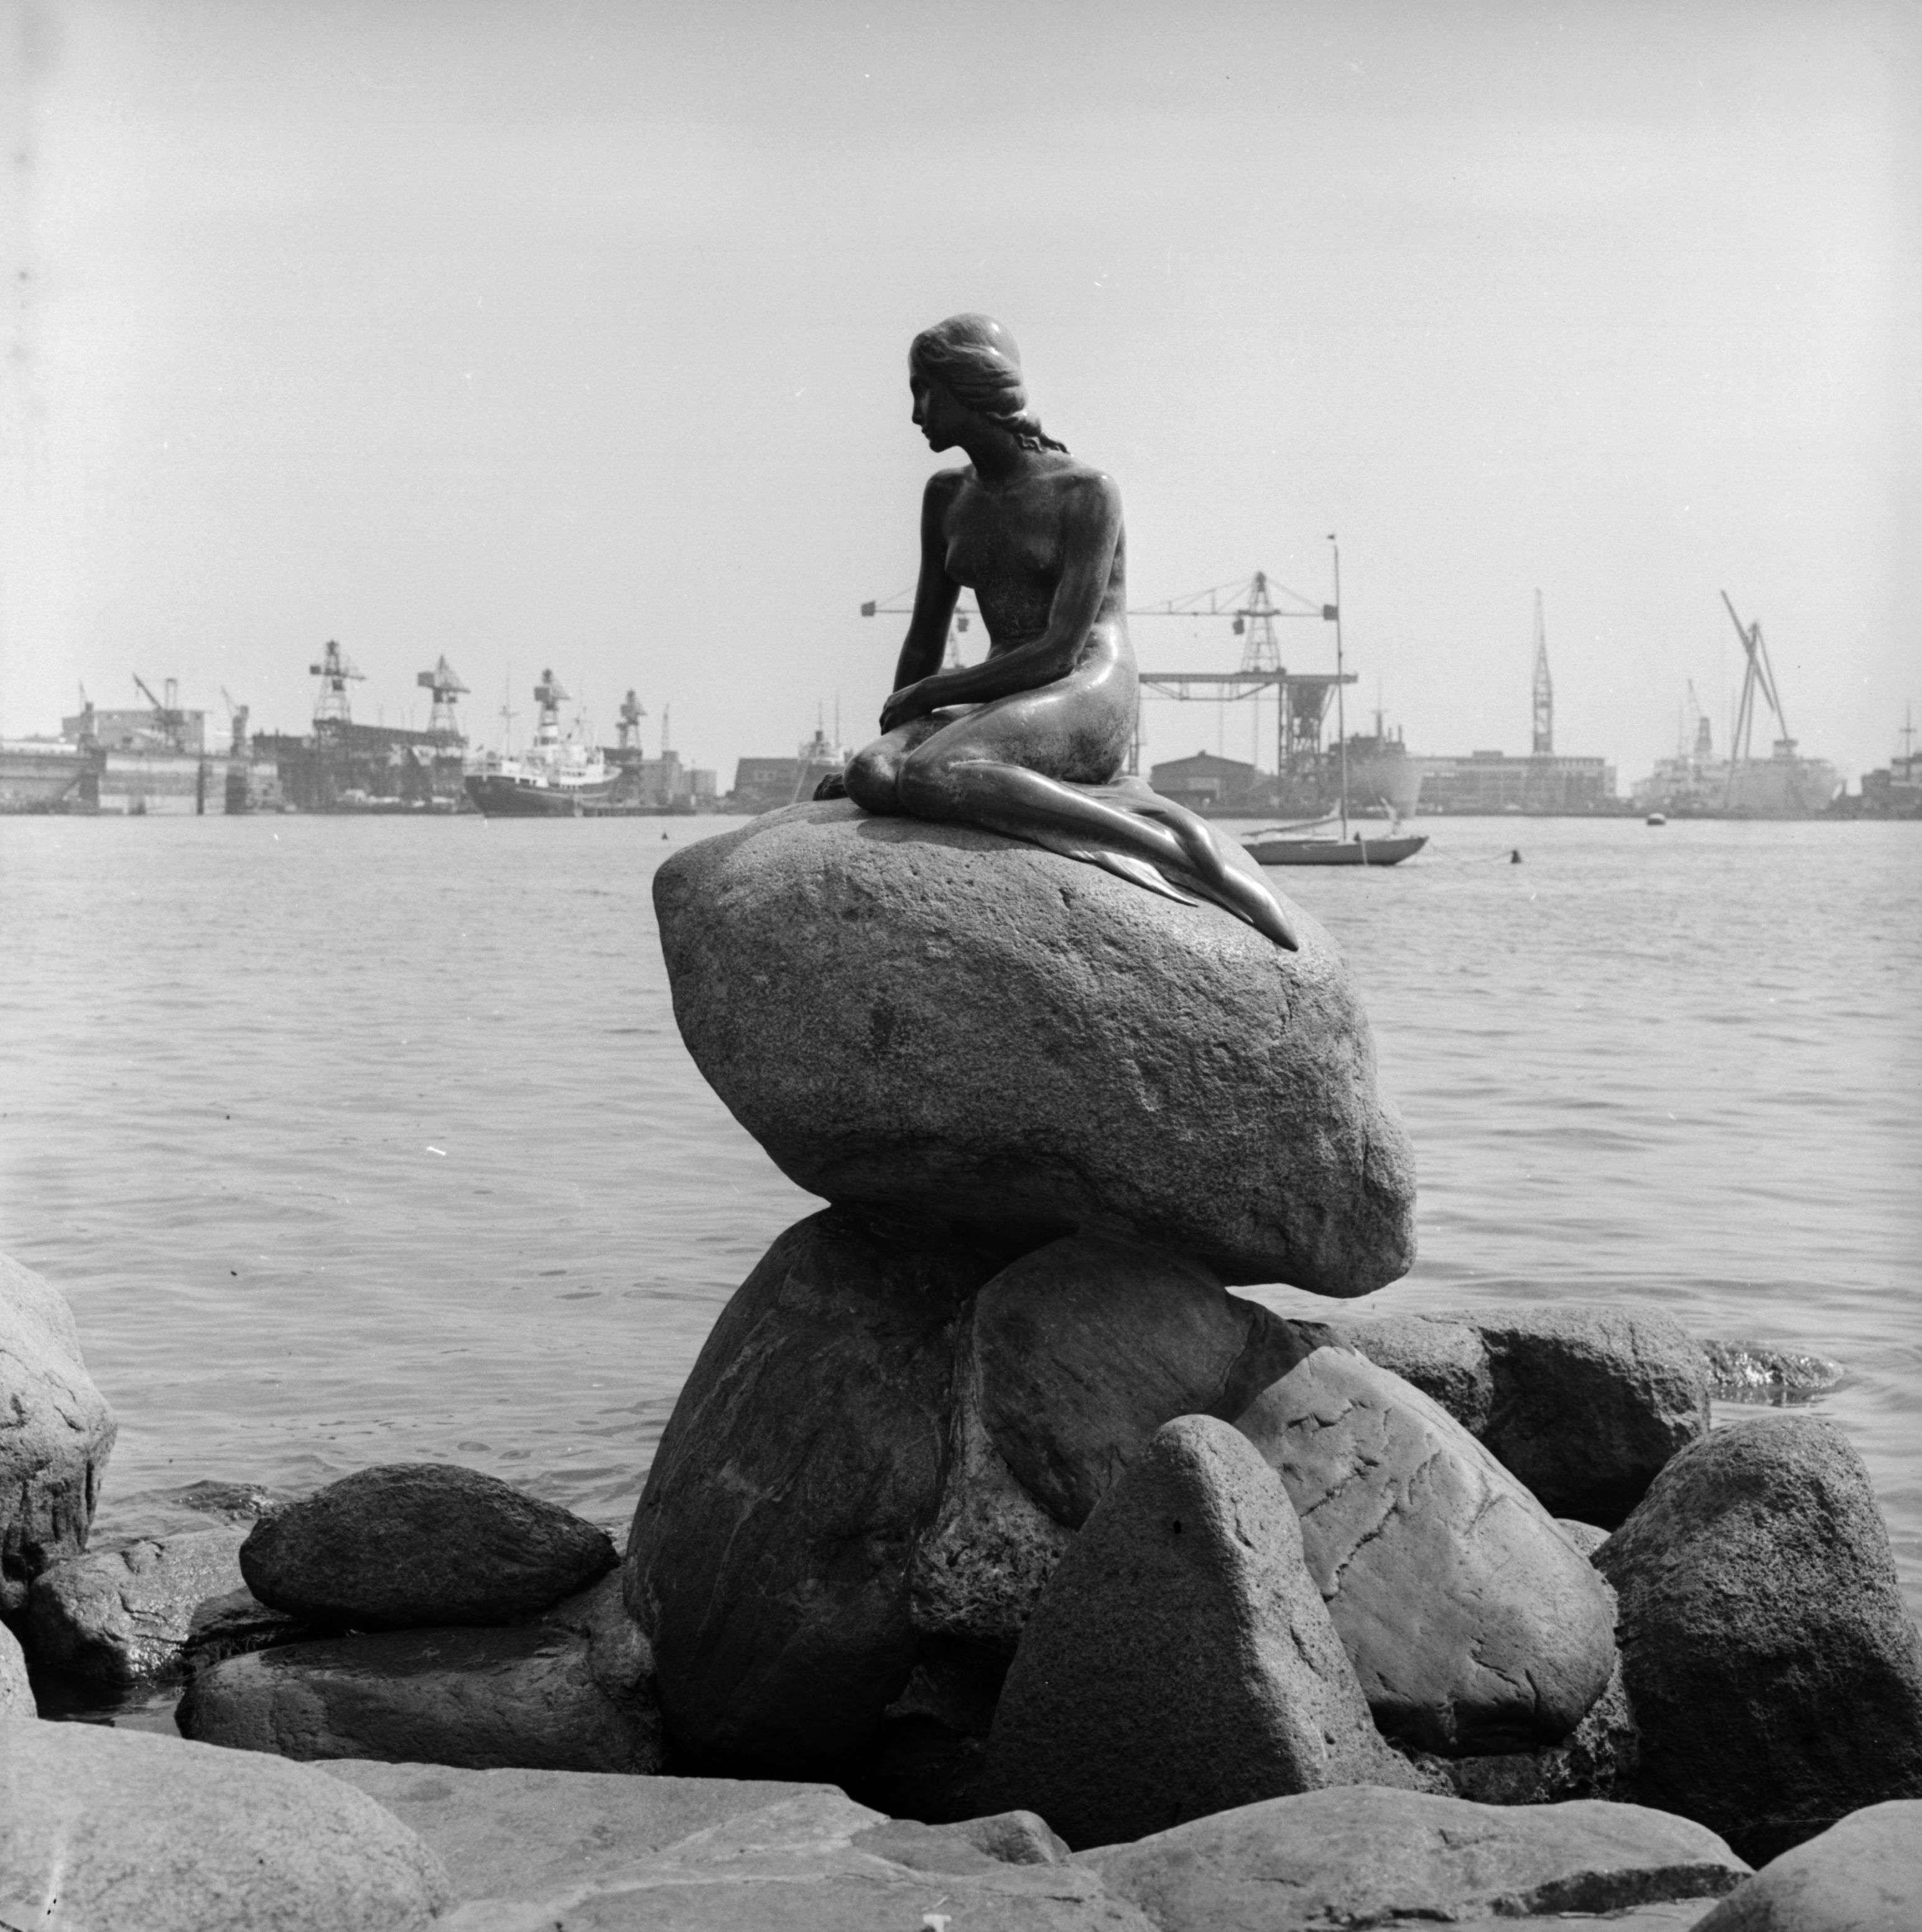 Slide 20 of 55: 30th May 1957: The Little Mermaid statue in Copenhagen, Denmark. (Photo by Derek Berwin/Fox Photos/Getty Images)